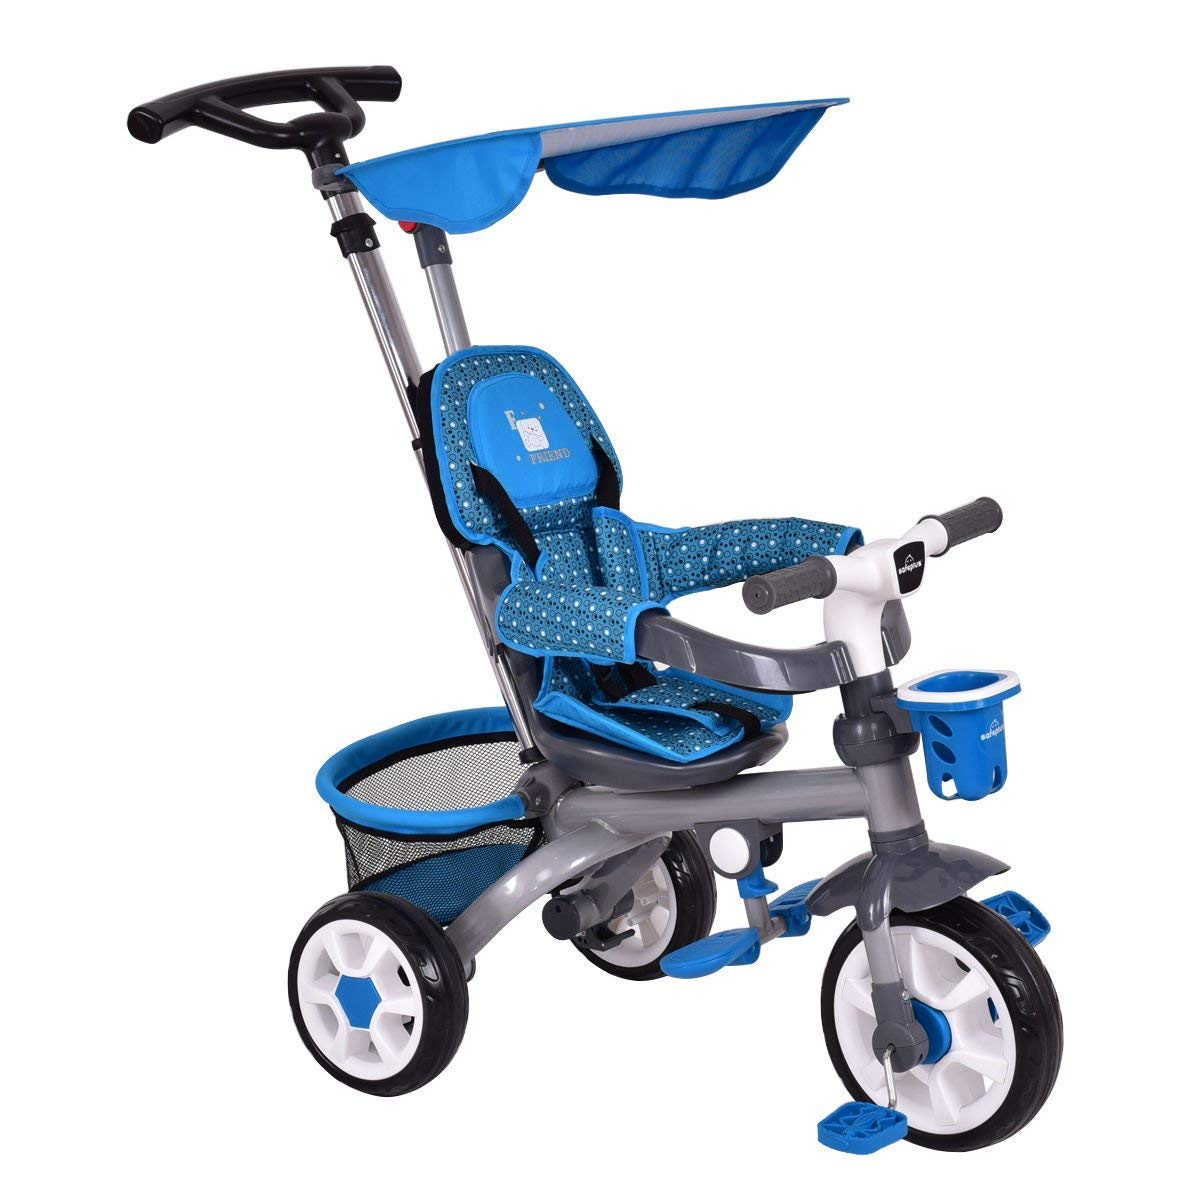 Amazon.com: HONEY JOY 4 en 1 Twins Kids Trike bebé bebé ...